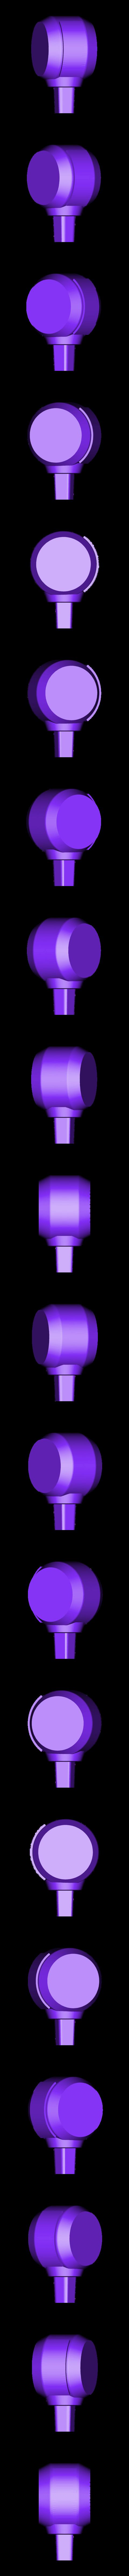 Elbow-Right.stl Download STL file Hammond's Wrecking Ball Mech from Overwatch • 3D printer template, FunbieStudios